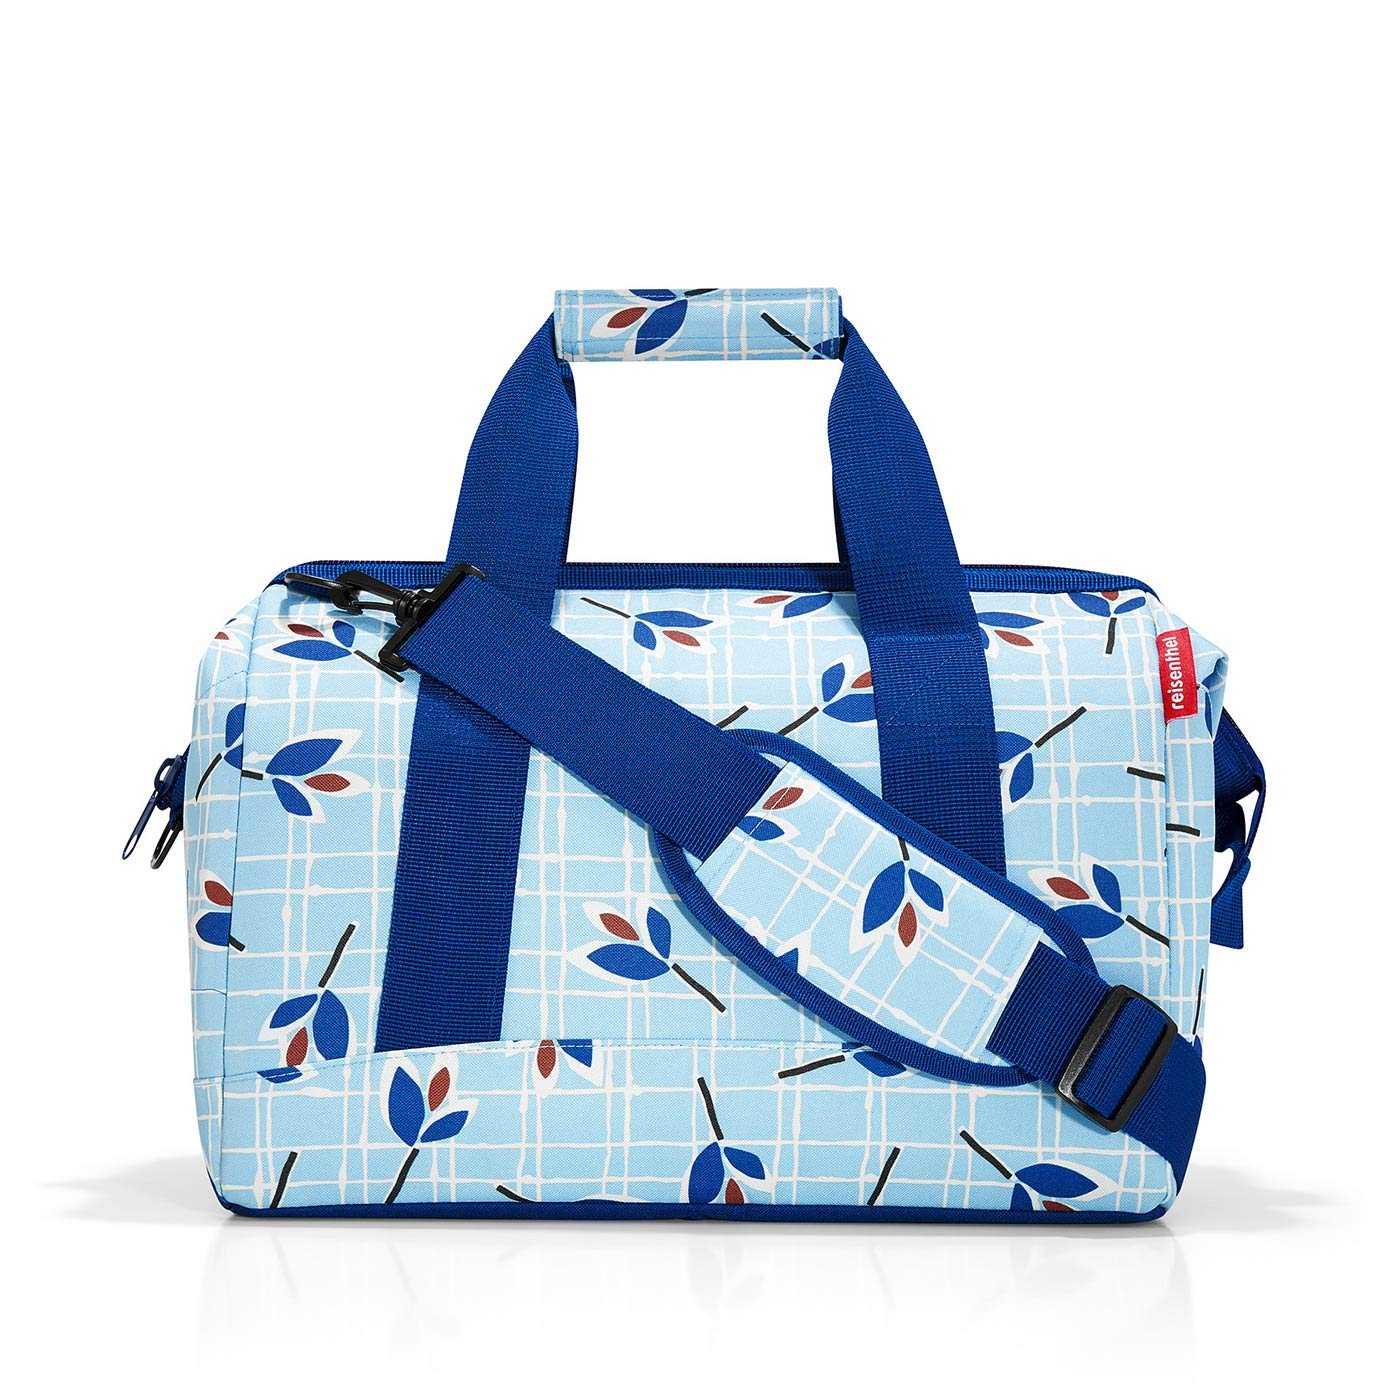 - MS4064 Leaves Blue Bleu Reisenthel Allrounder M Sac de Voyage 40 cm